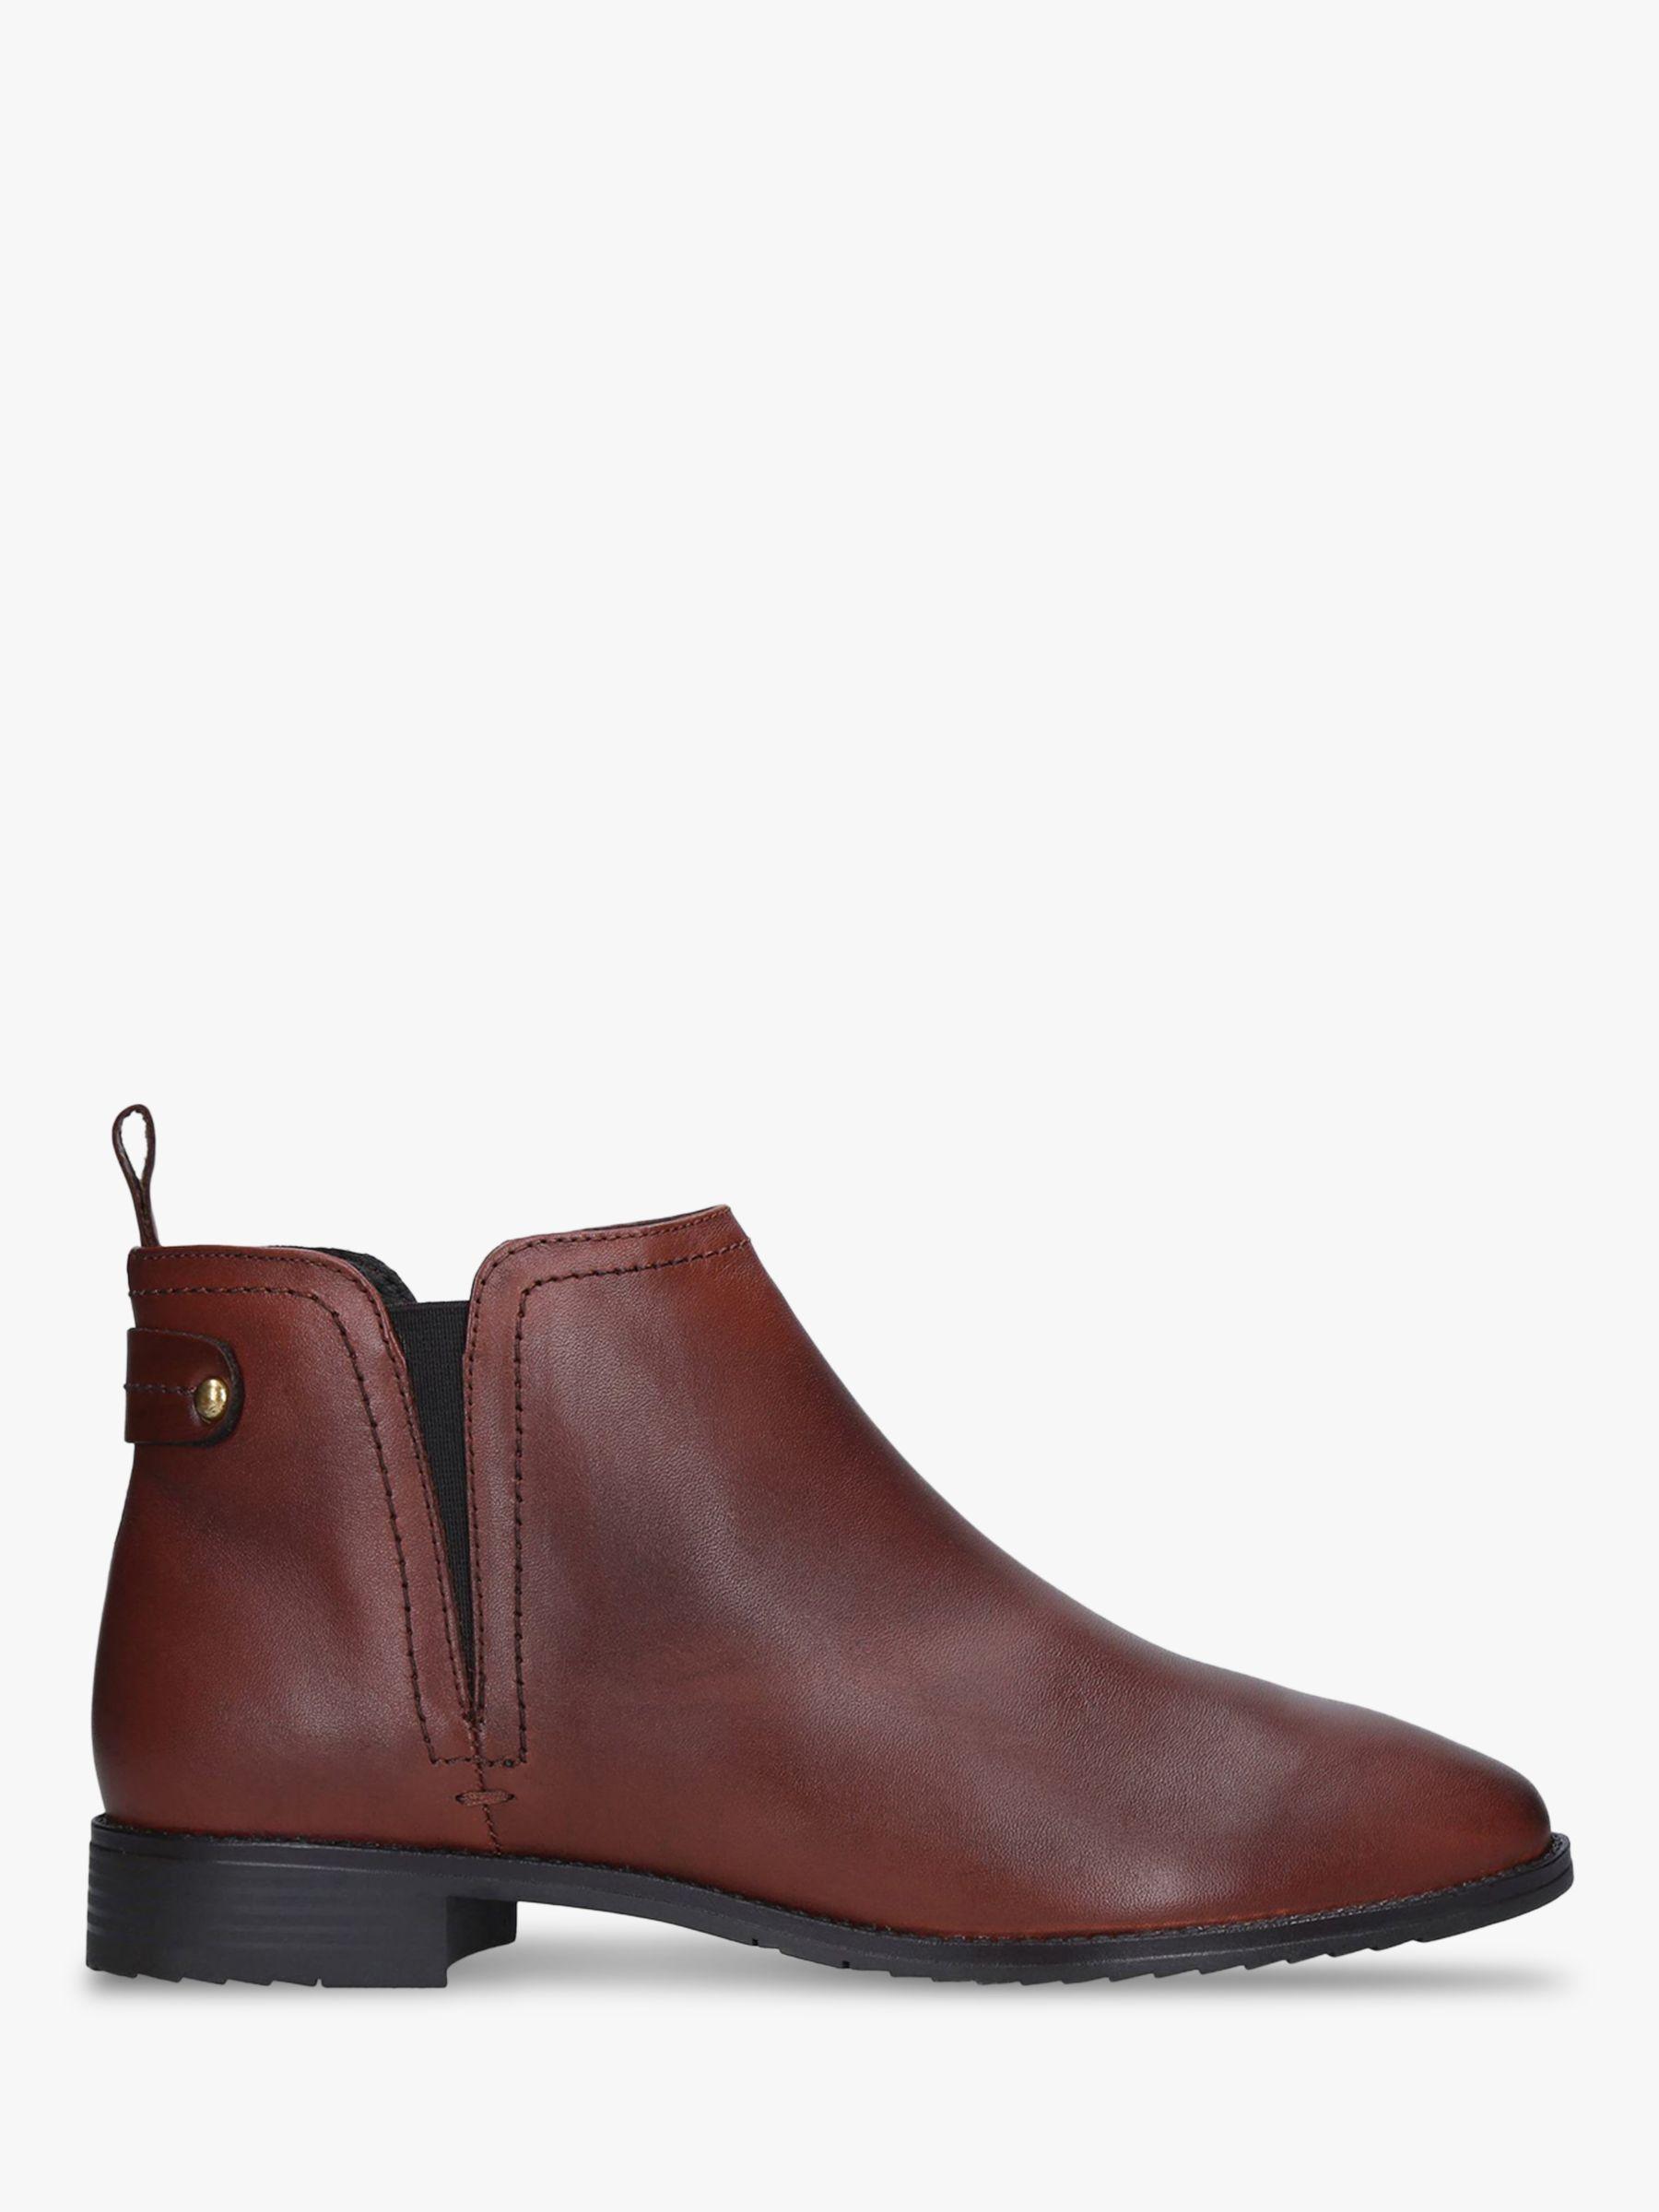 Carvela Comfort Carvela Comfort Rexx Leather Chelsea Boots